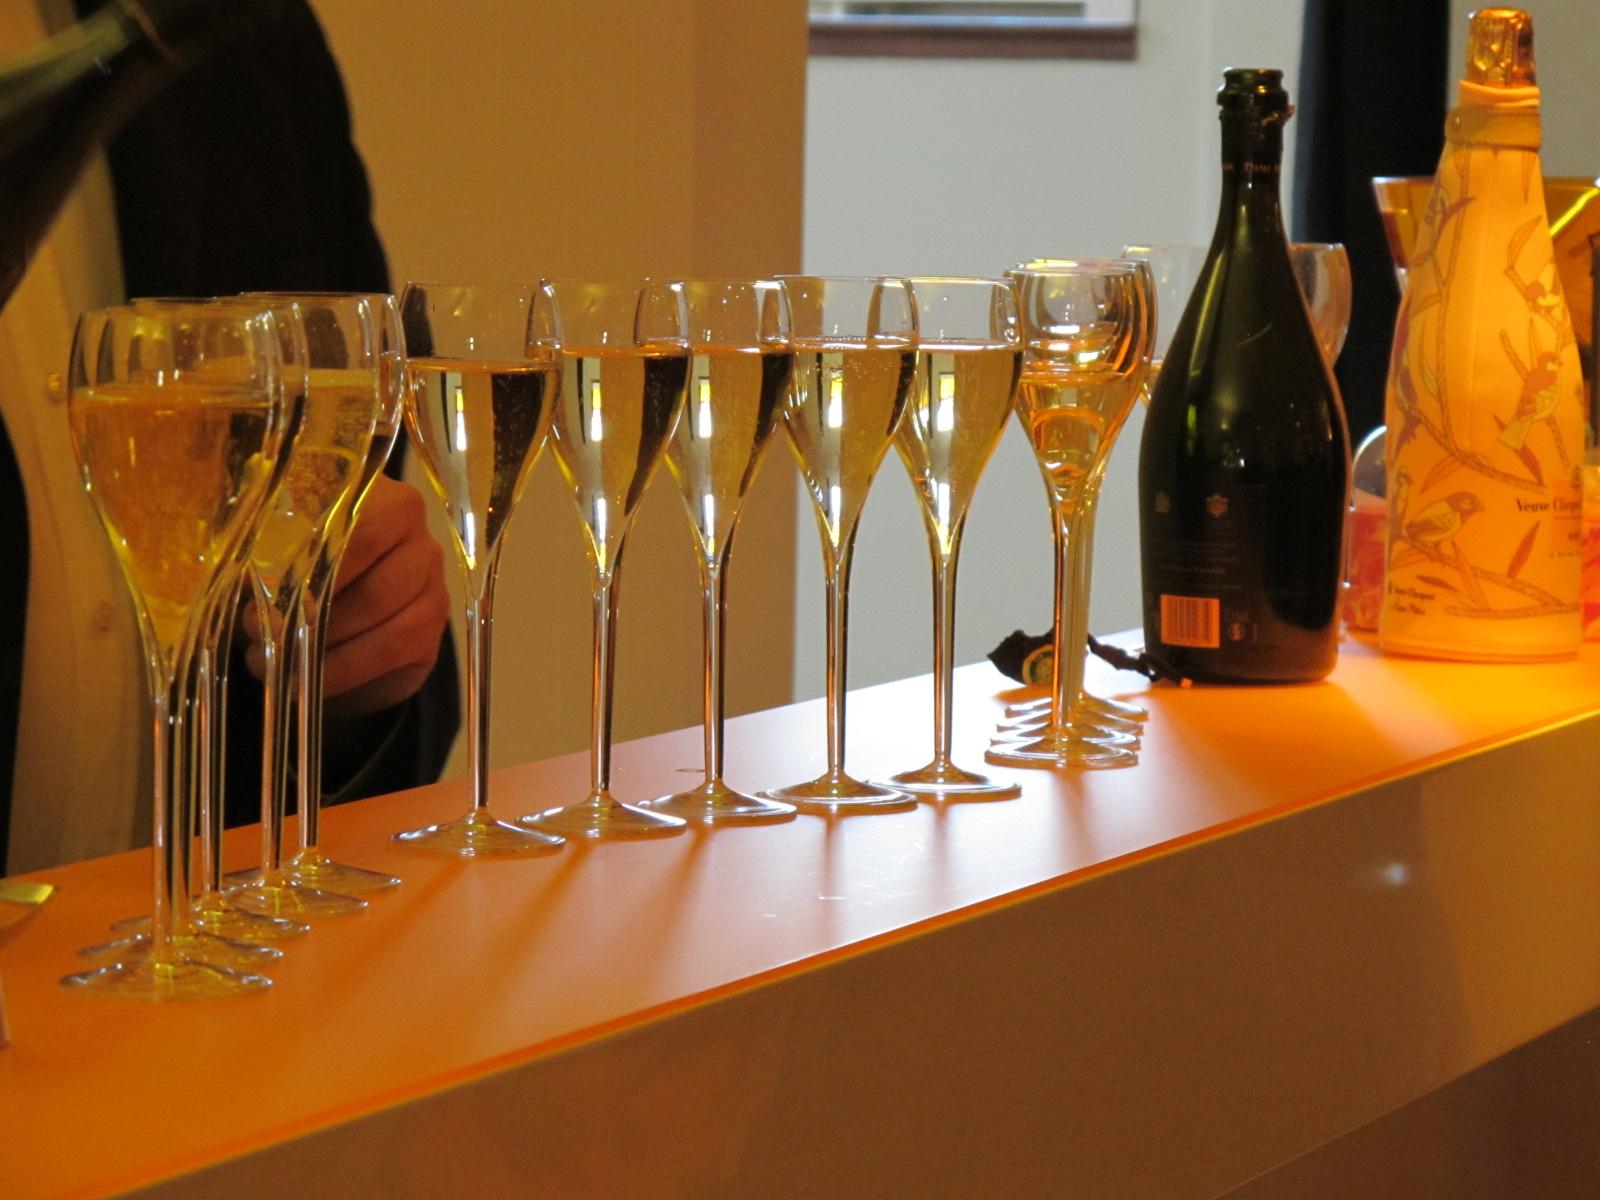 the tasty side to life veuve clicquot vs mumm champagne. Black Bedroom Furniture Sets. Home Design Ideas